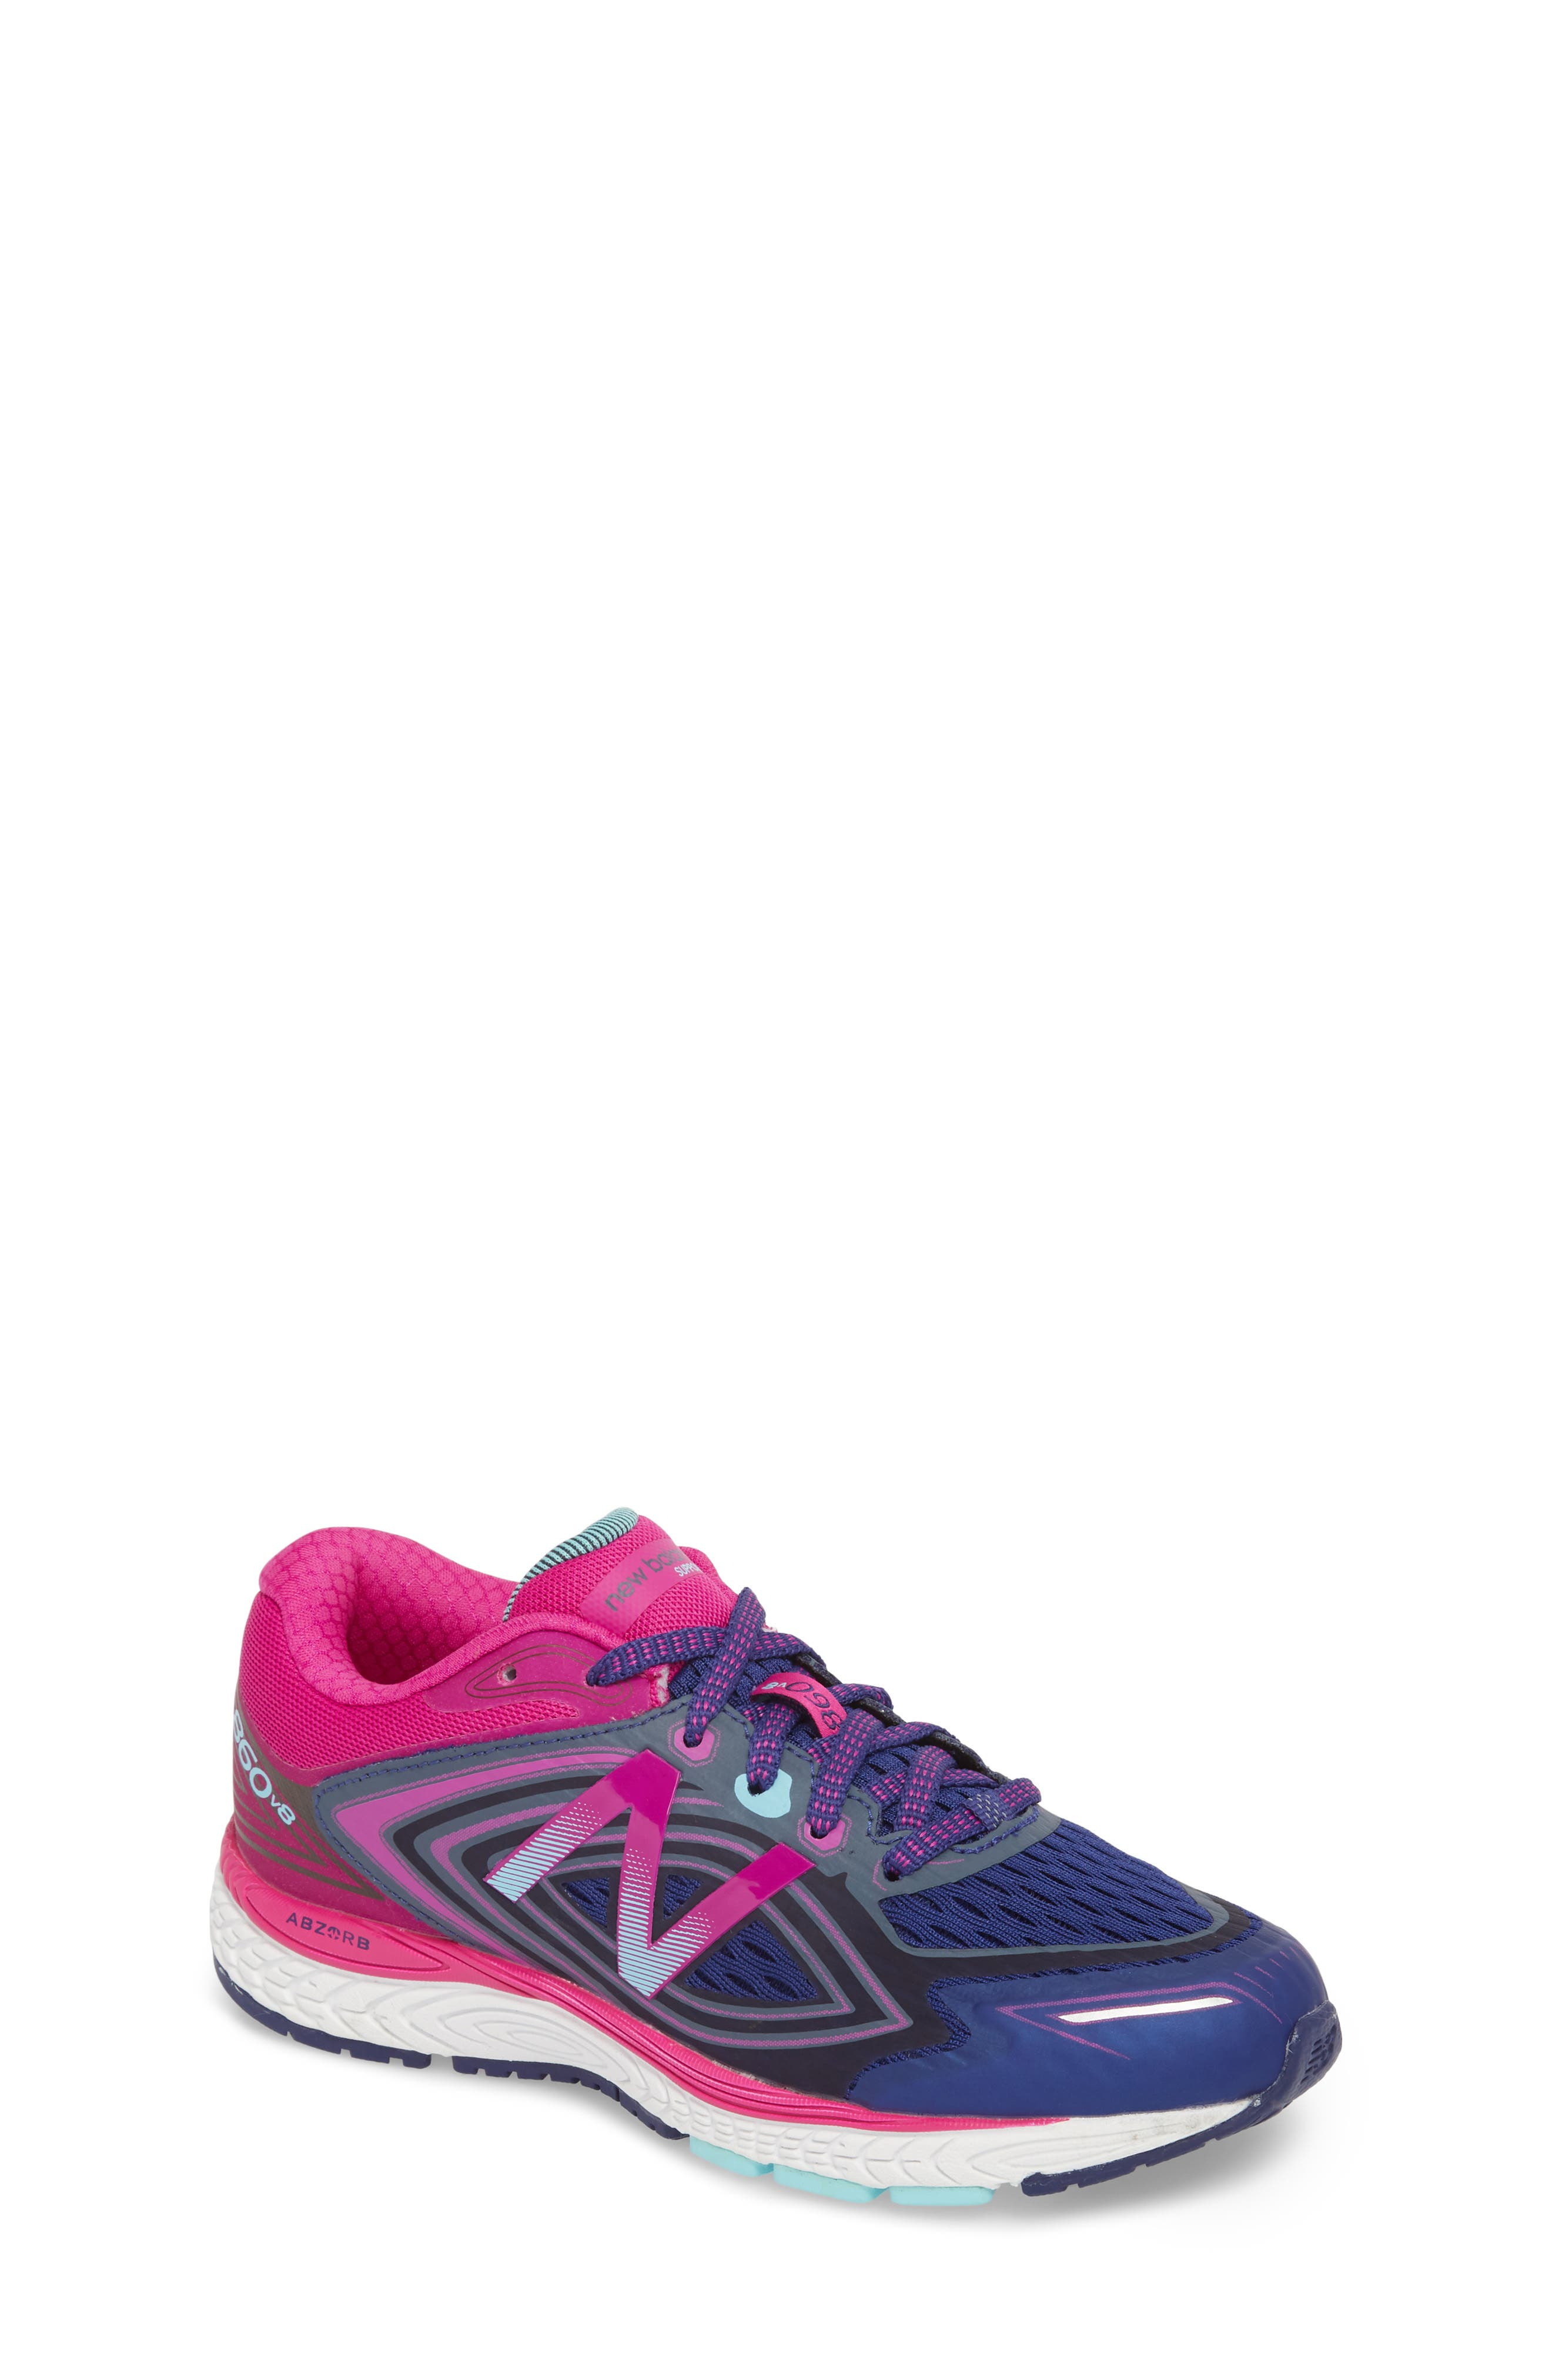 860v8 Sneaker,                             Main thumbnail 1, color,                             410